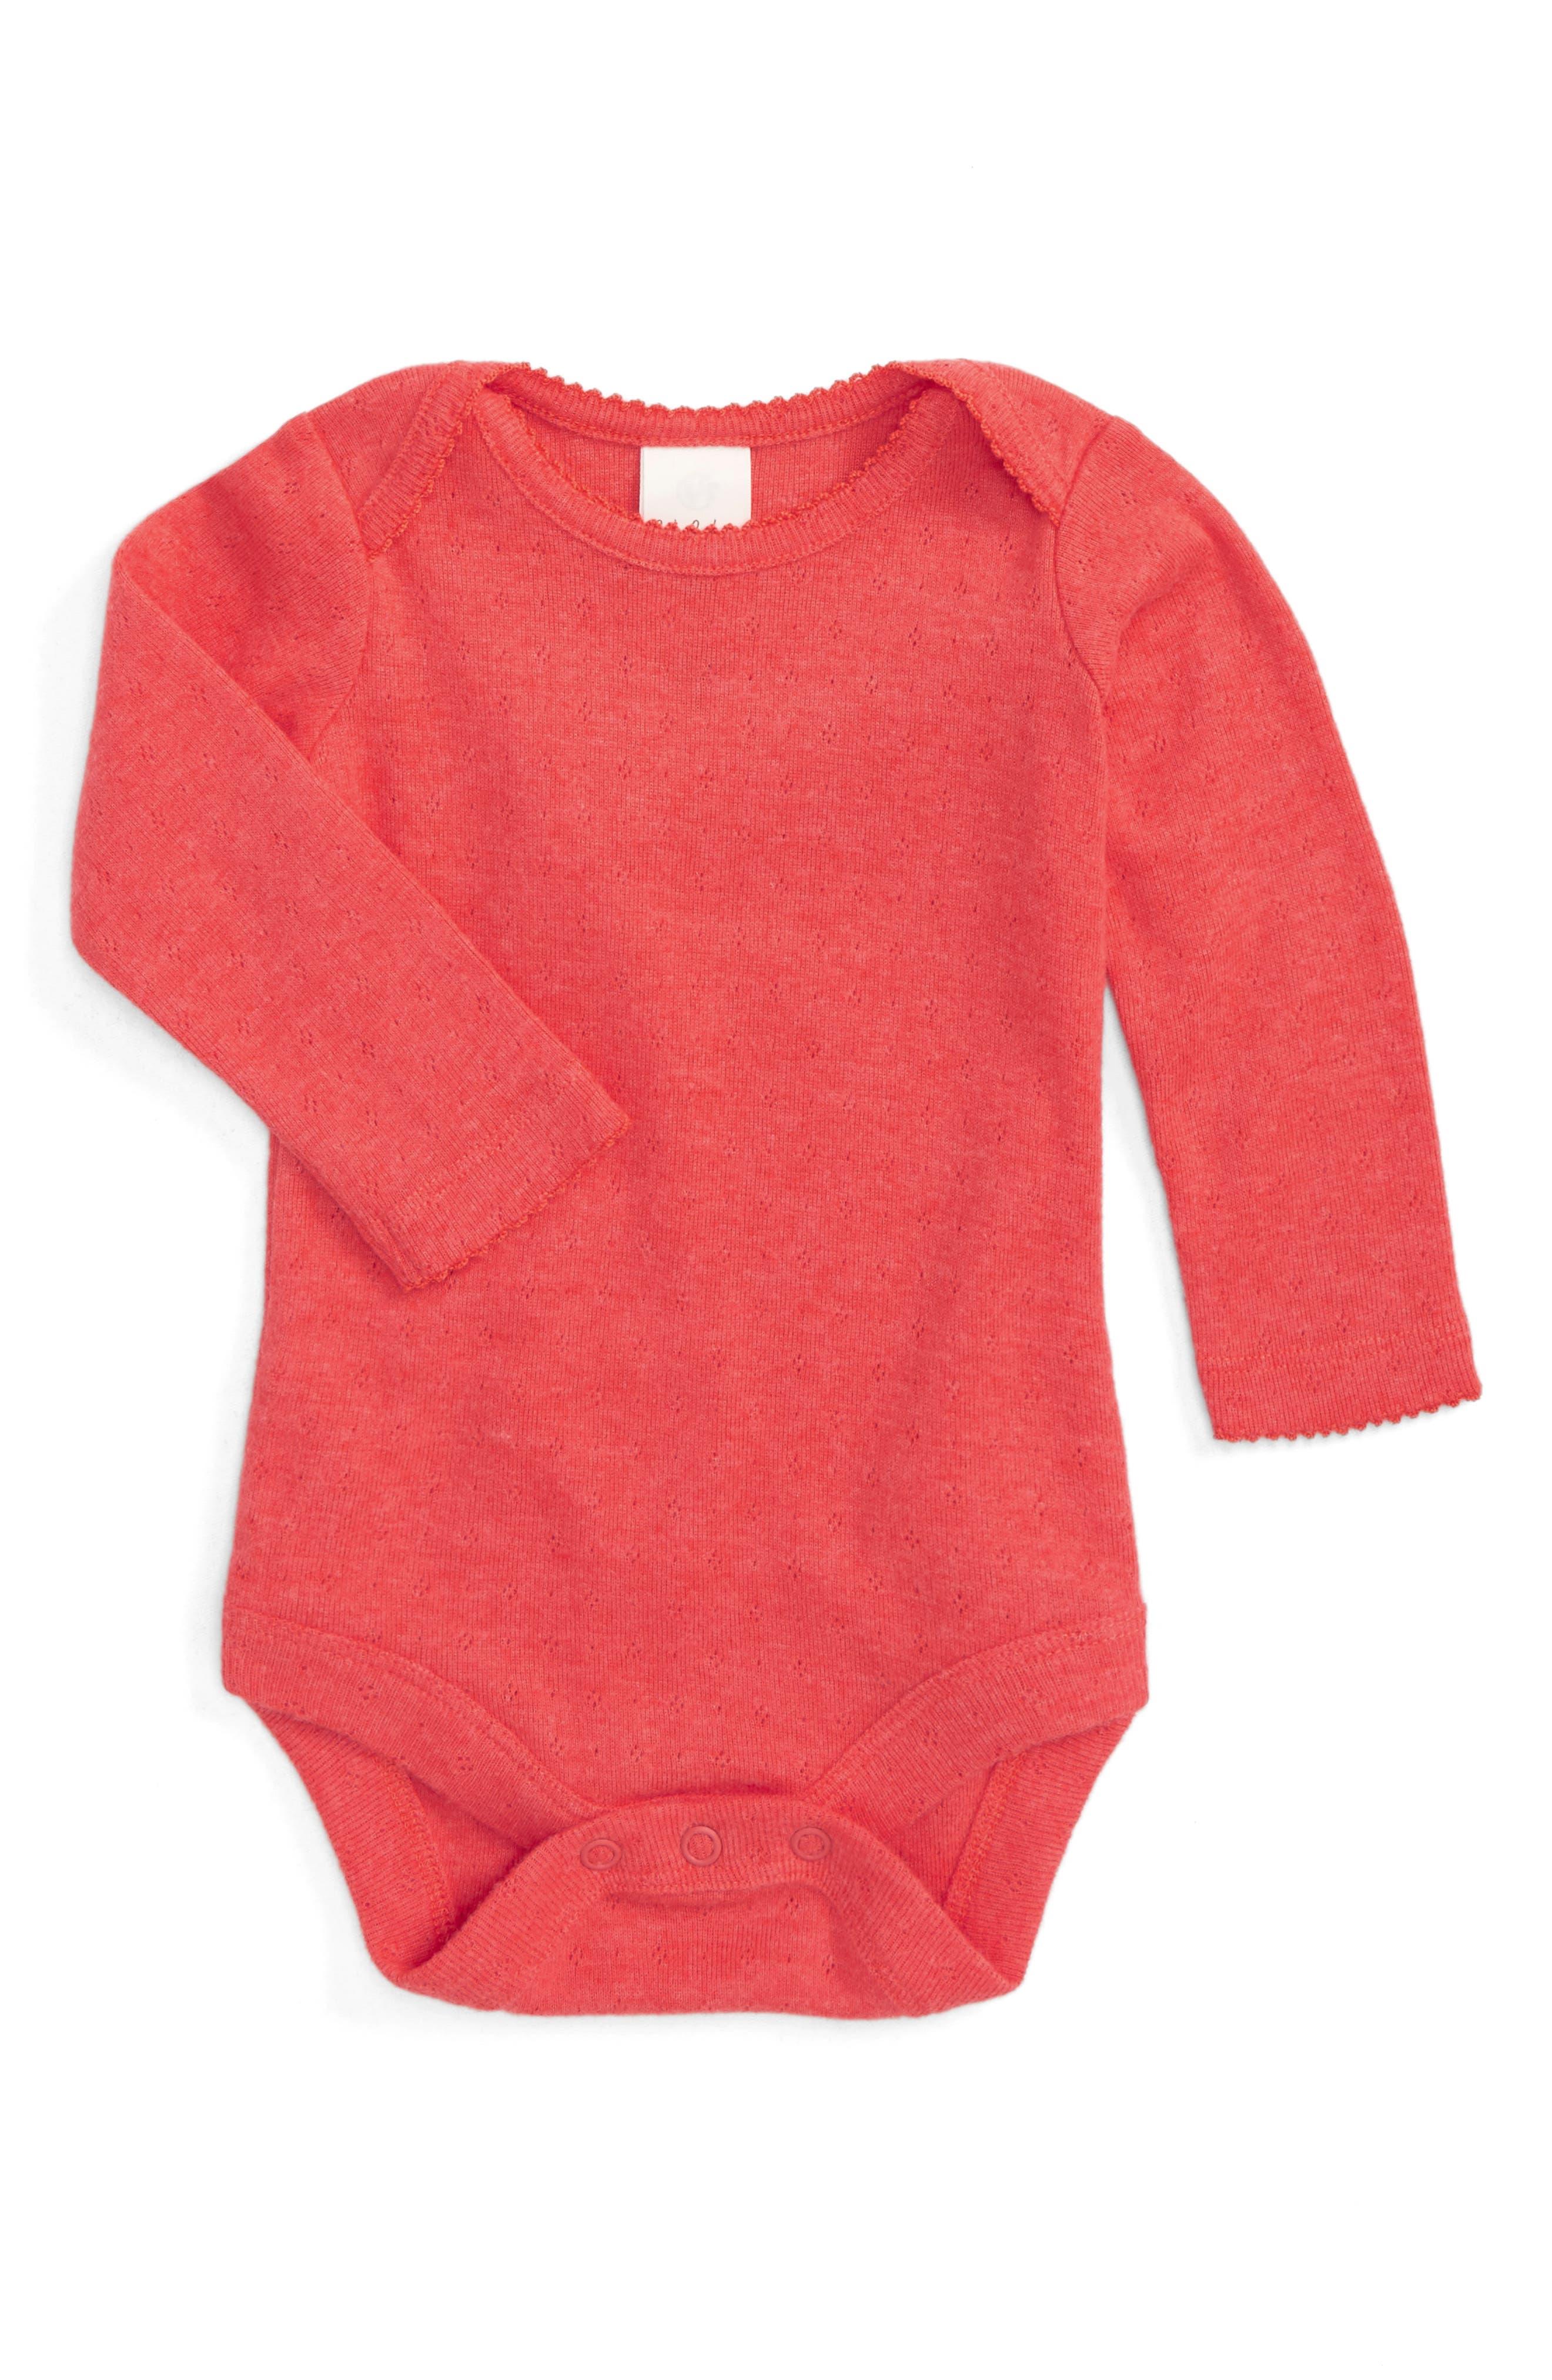 Supersoft Pointelle Bodysuit,                             Main thumbnail 1, color,                             Red Jam